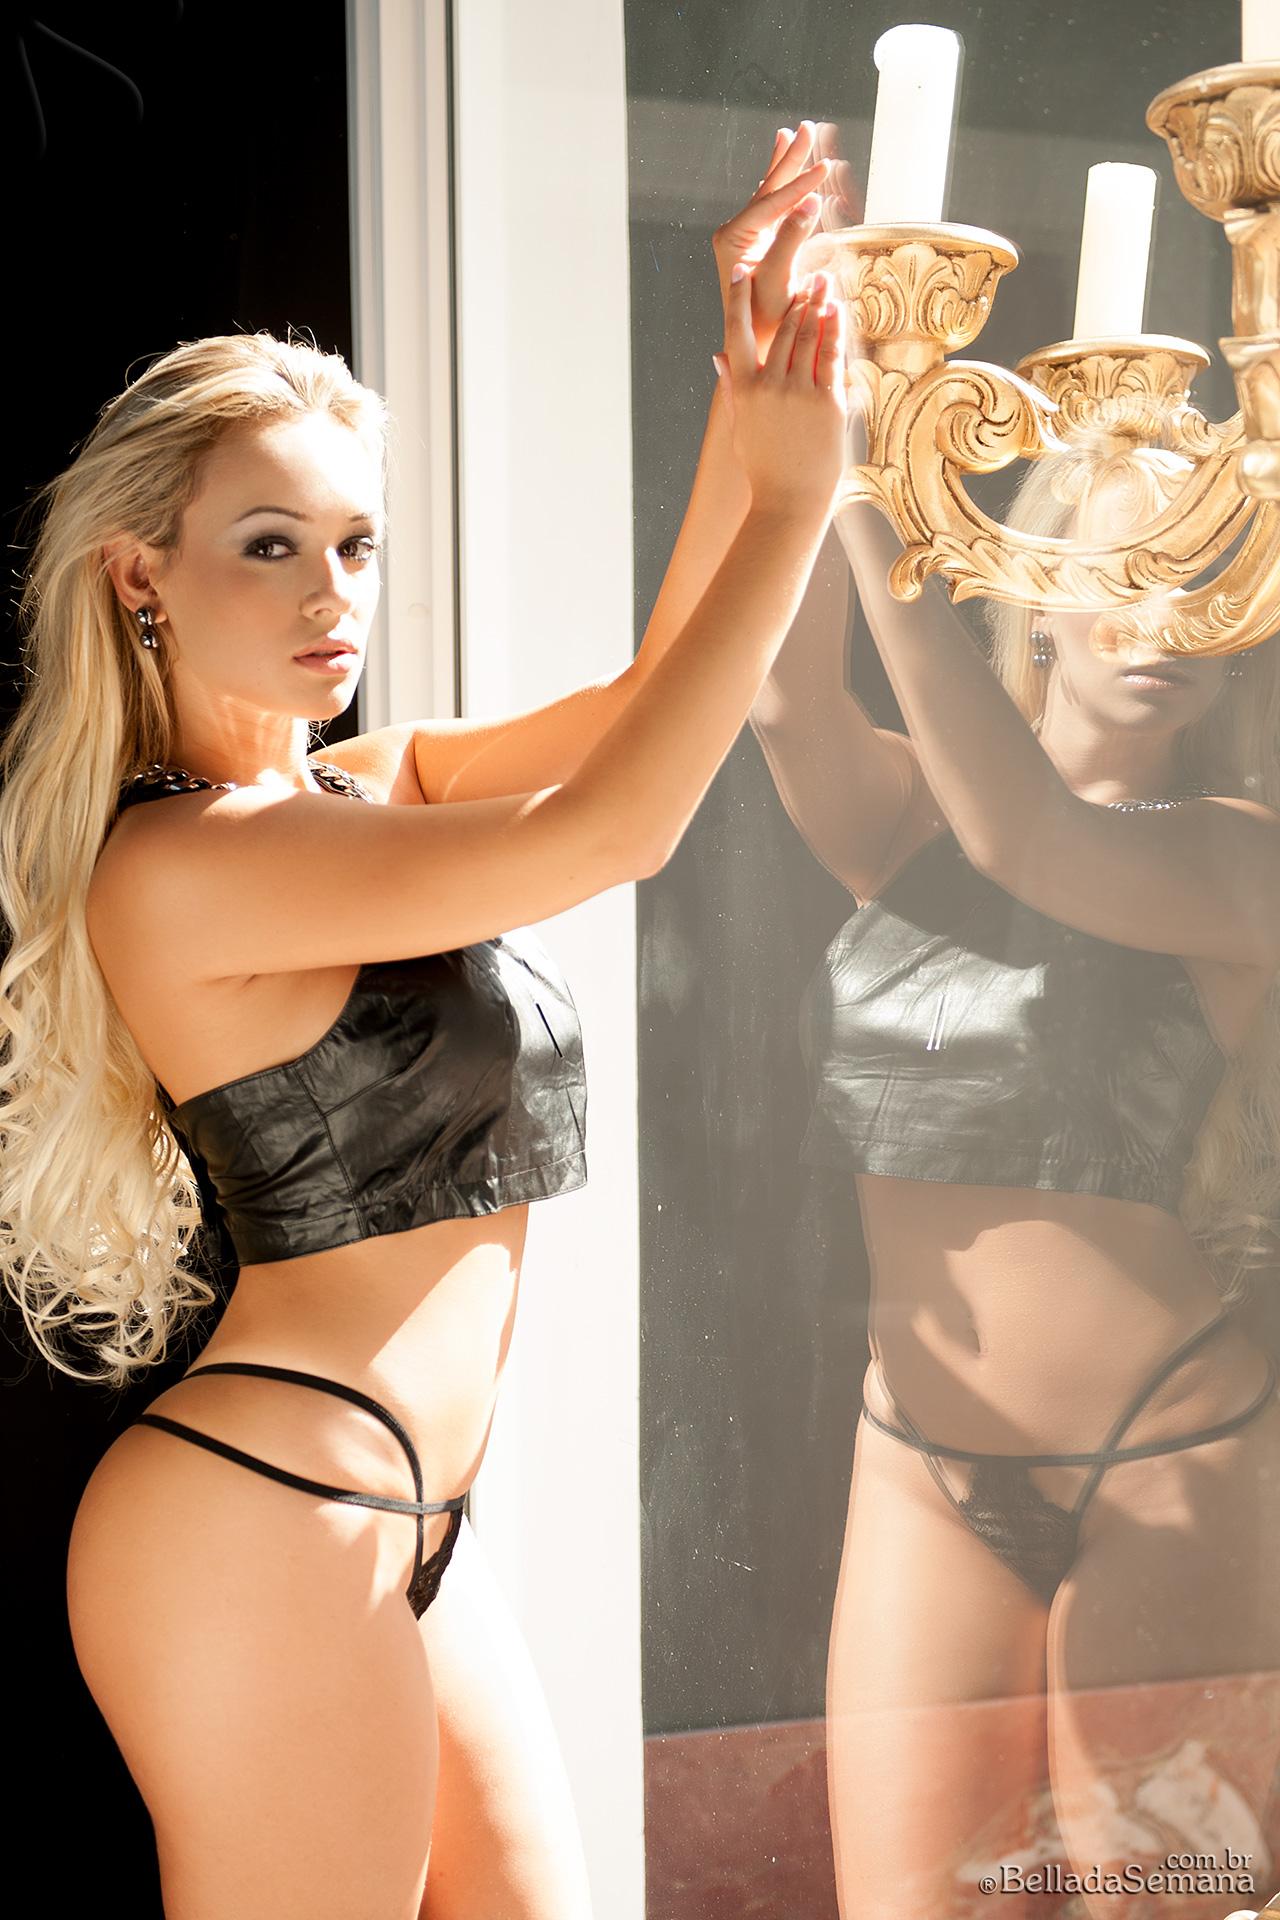 Liziane Soares in lingerie